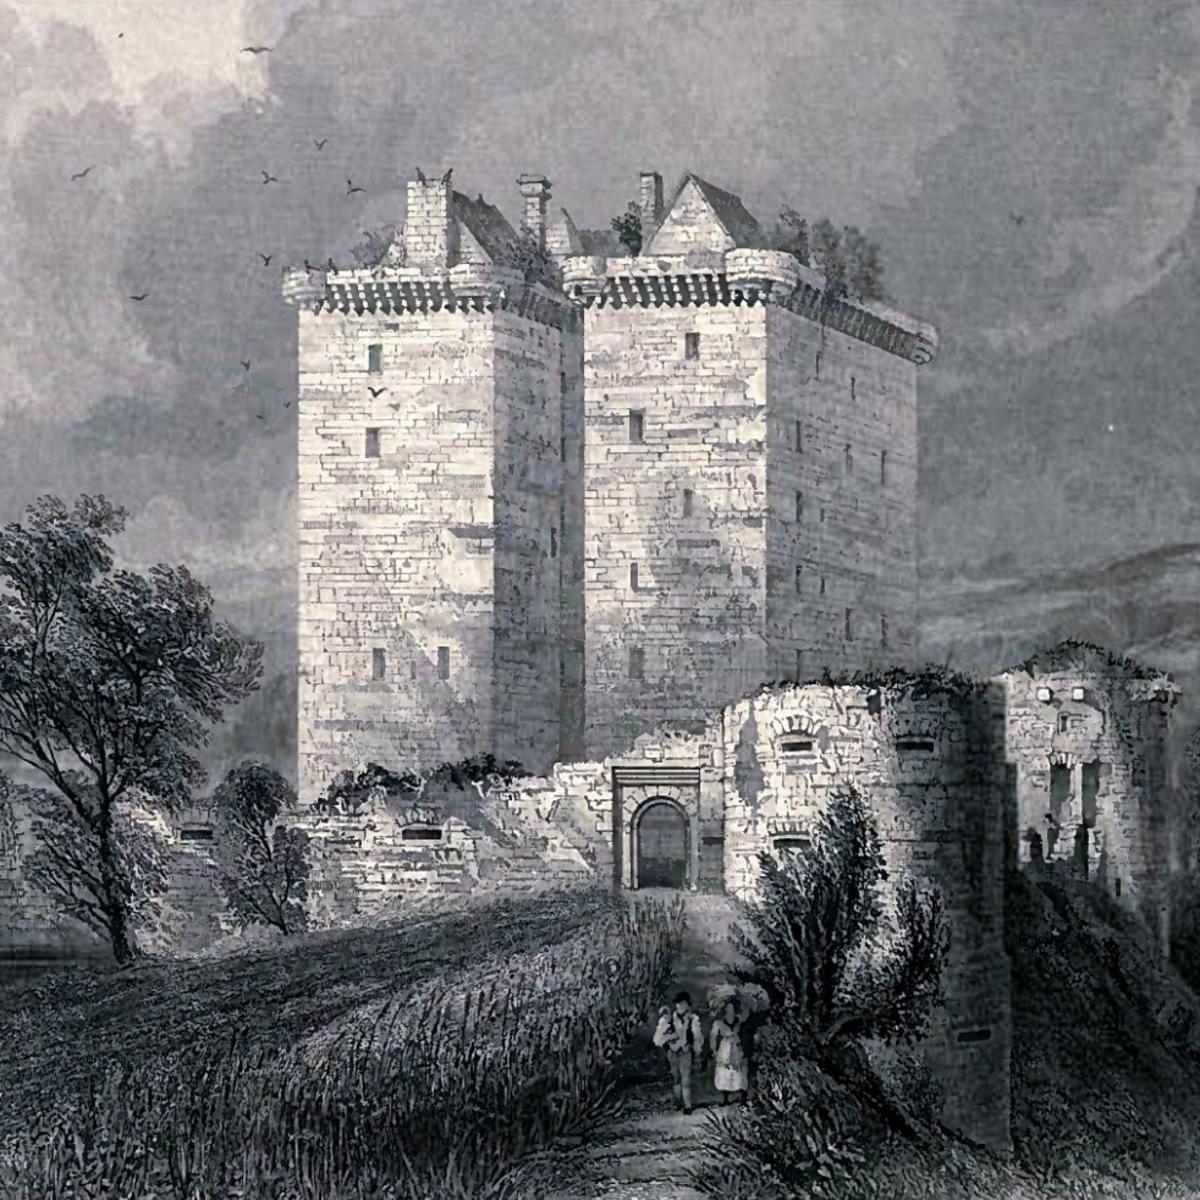 Borthwick Castle, Midlothian, Scotland